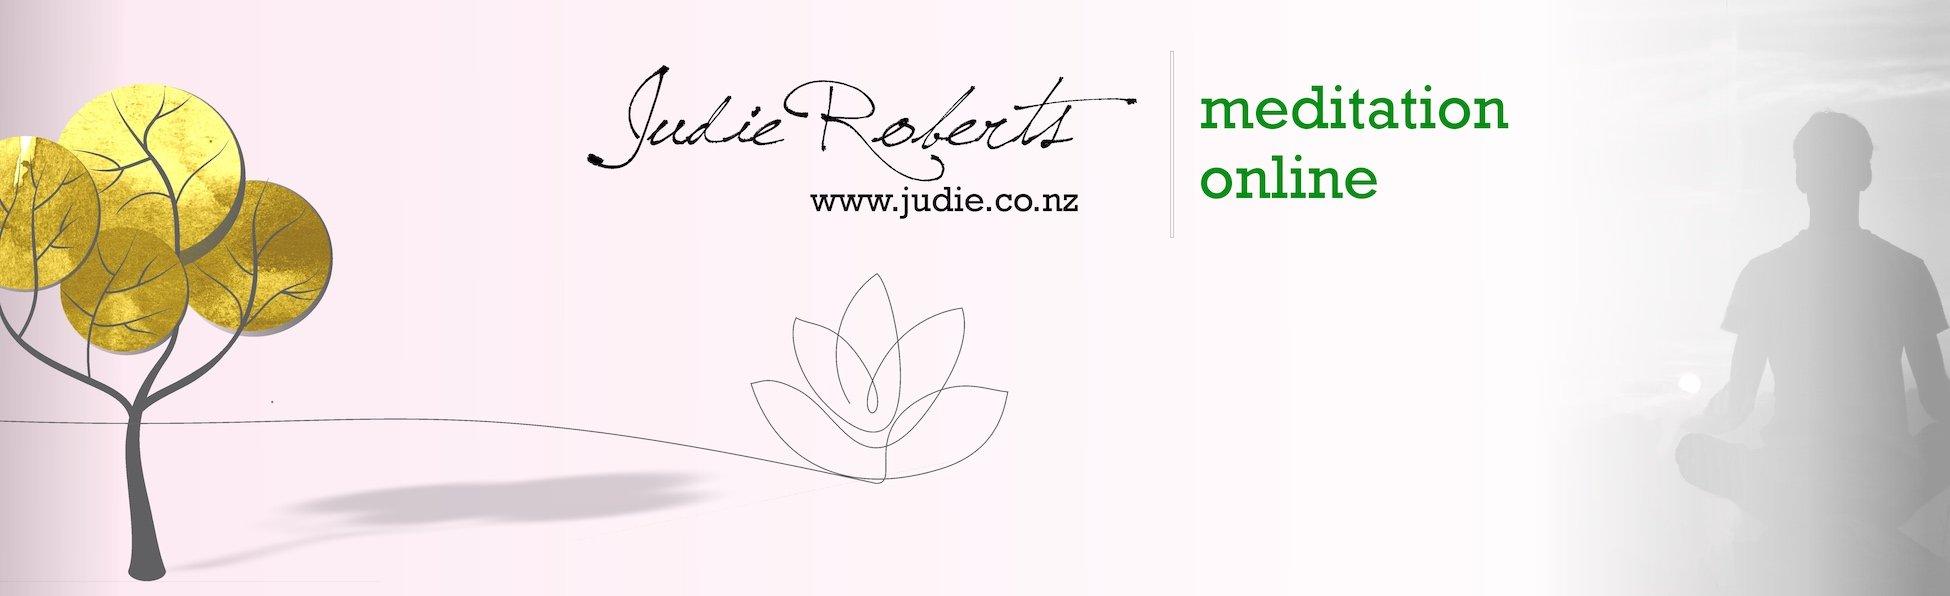 Mediation Online with Judie Roberts